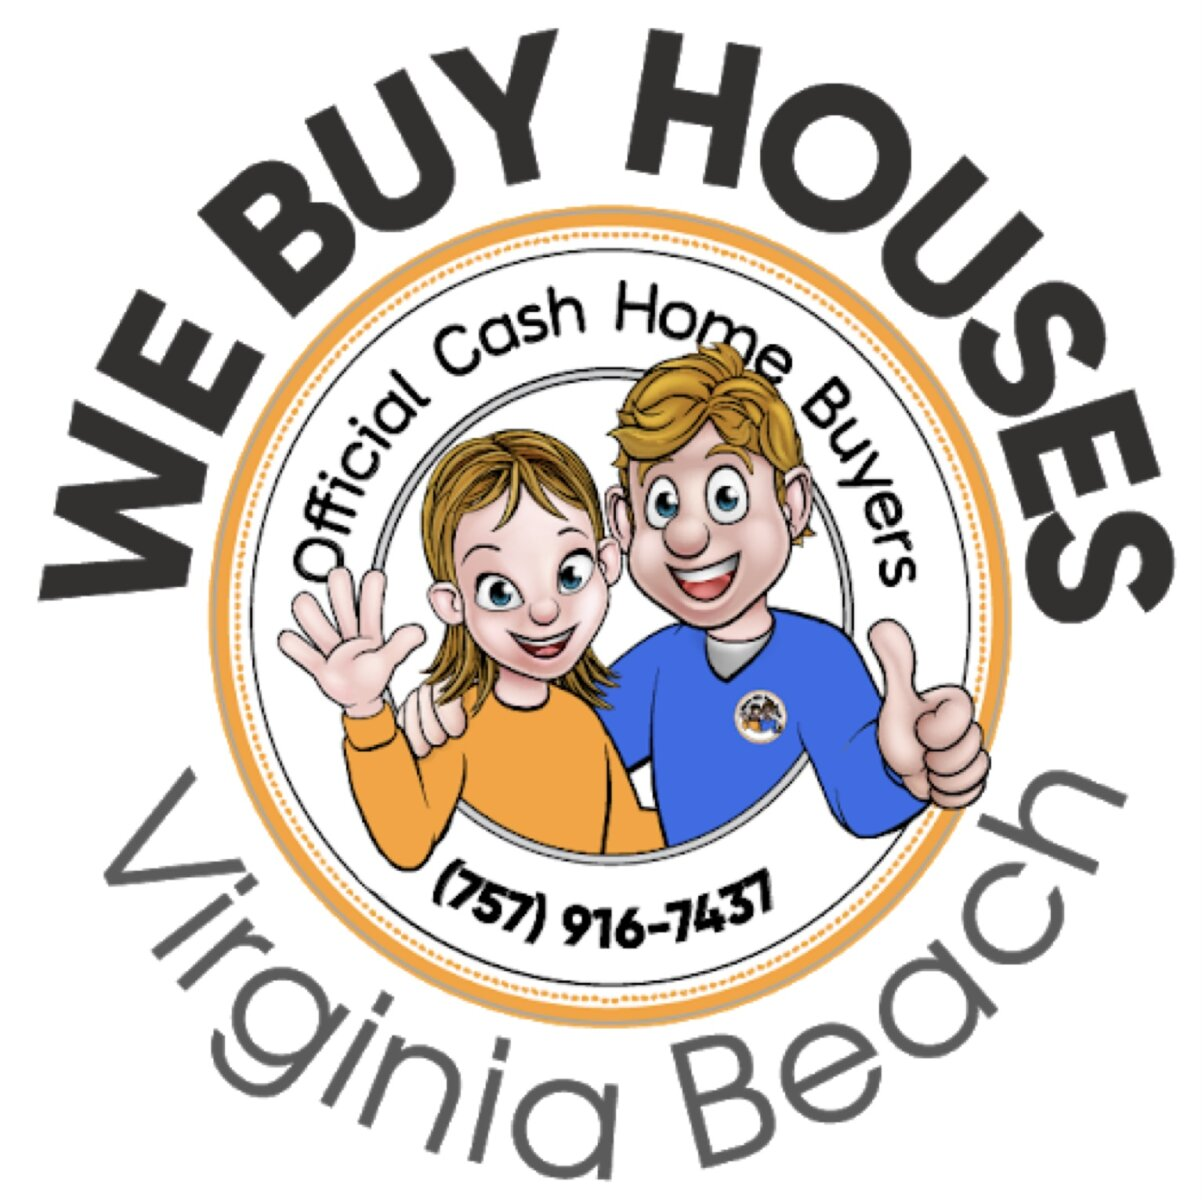 We Buy Houses Virginia Beach logo